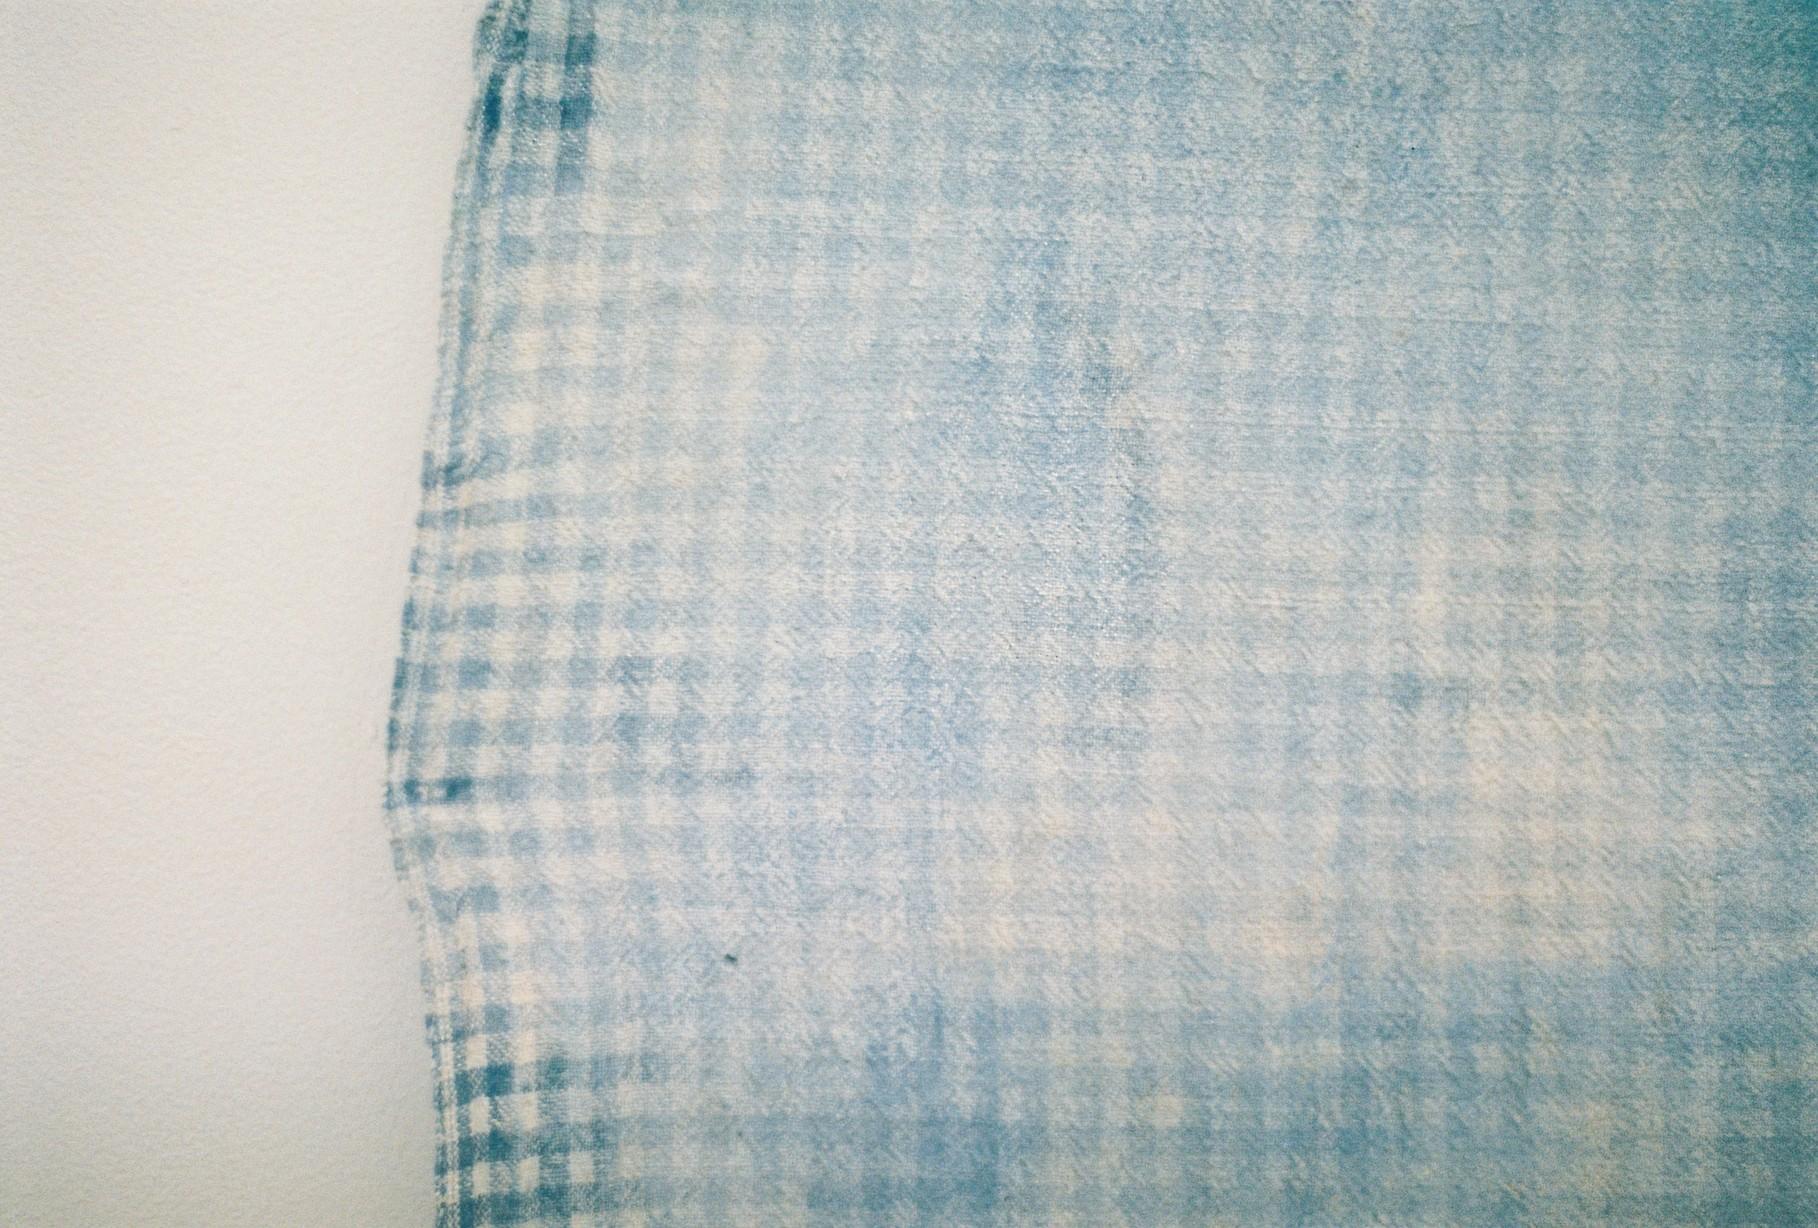 Jahnne Pasco–White,  The bluest feet around , 2017 ash, limestone, PVA, pigment, spray adhesive, acrylic on cotton courtesy Daine Singer, Melbourne